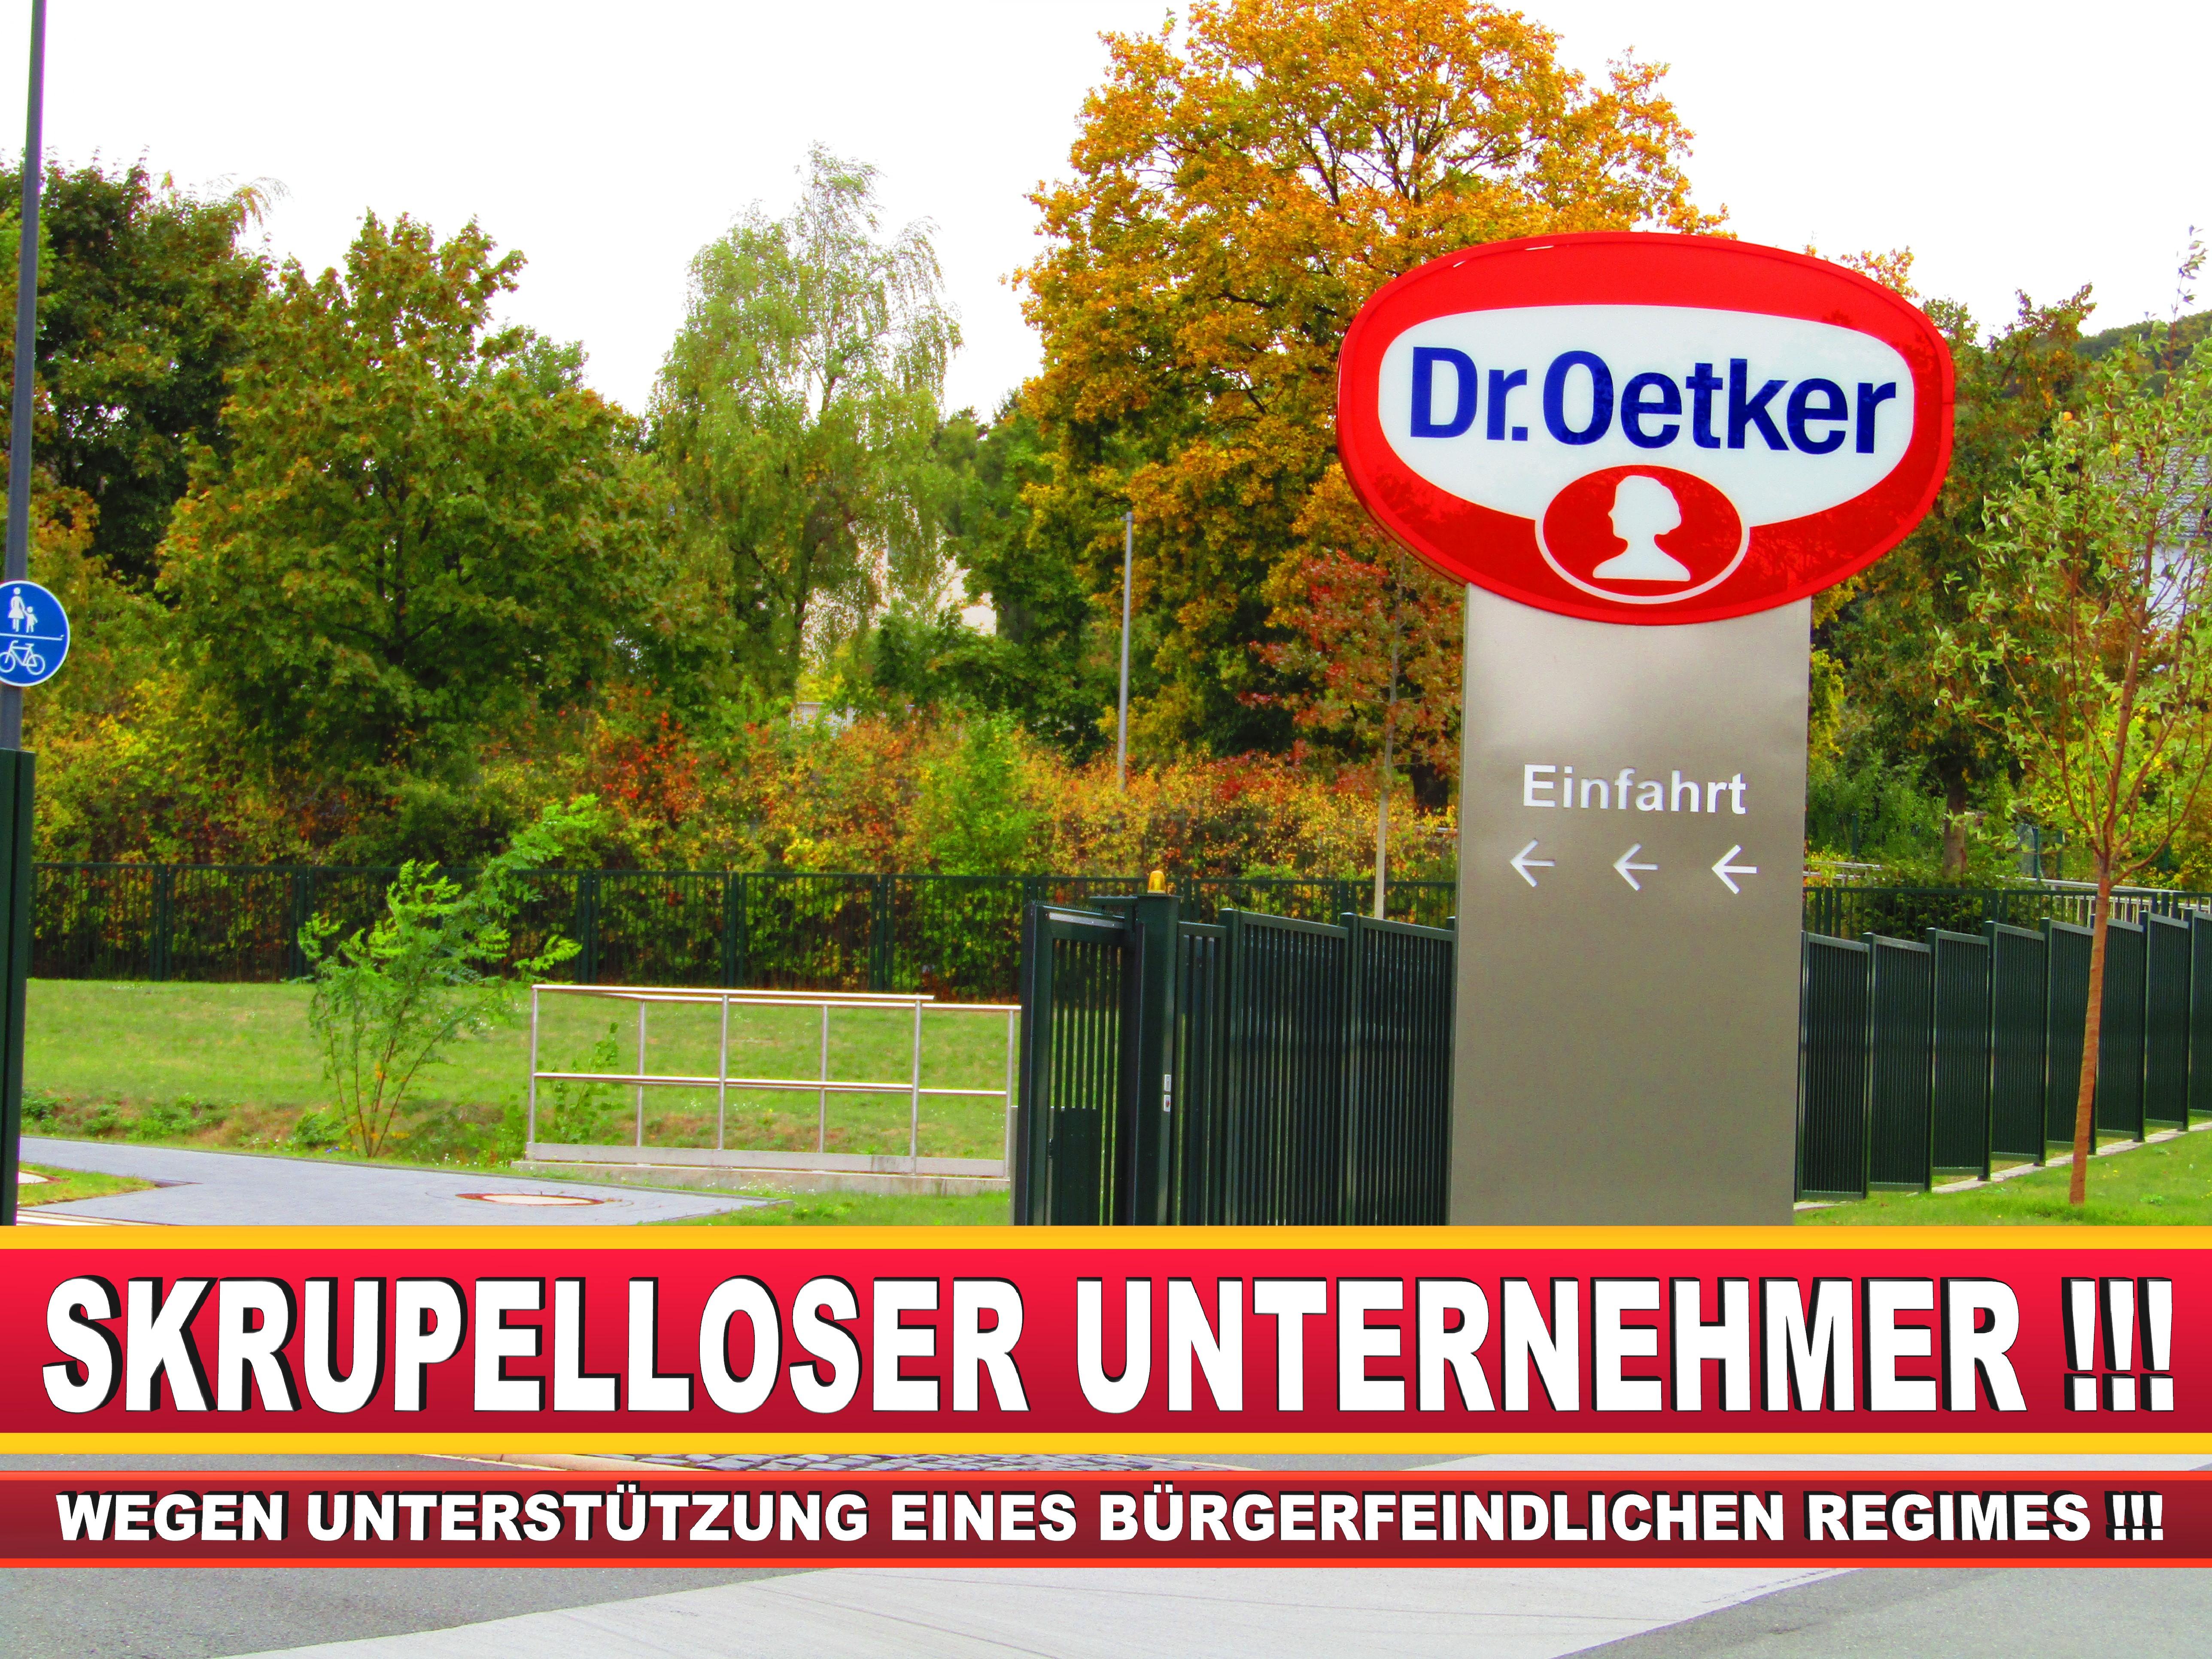 Dr Oetker Bielefeld CDU Bielefeld Spendengelder Skandal Richard August (11)